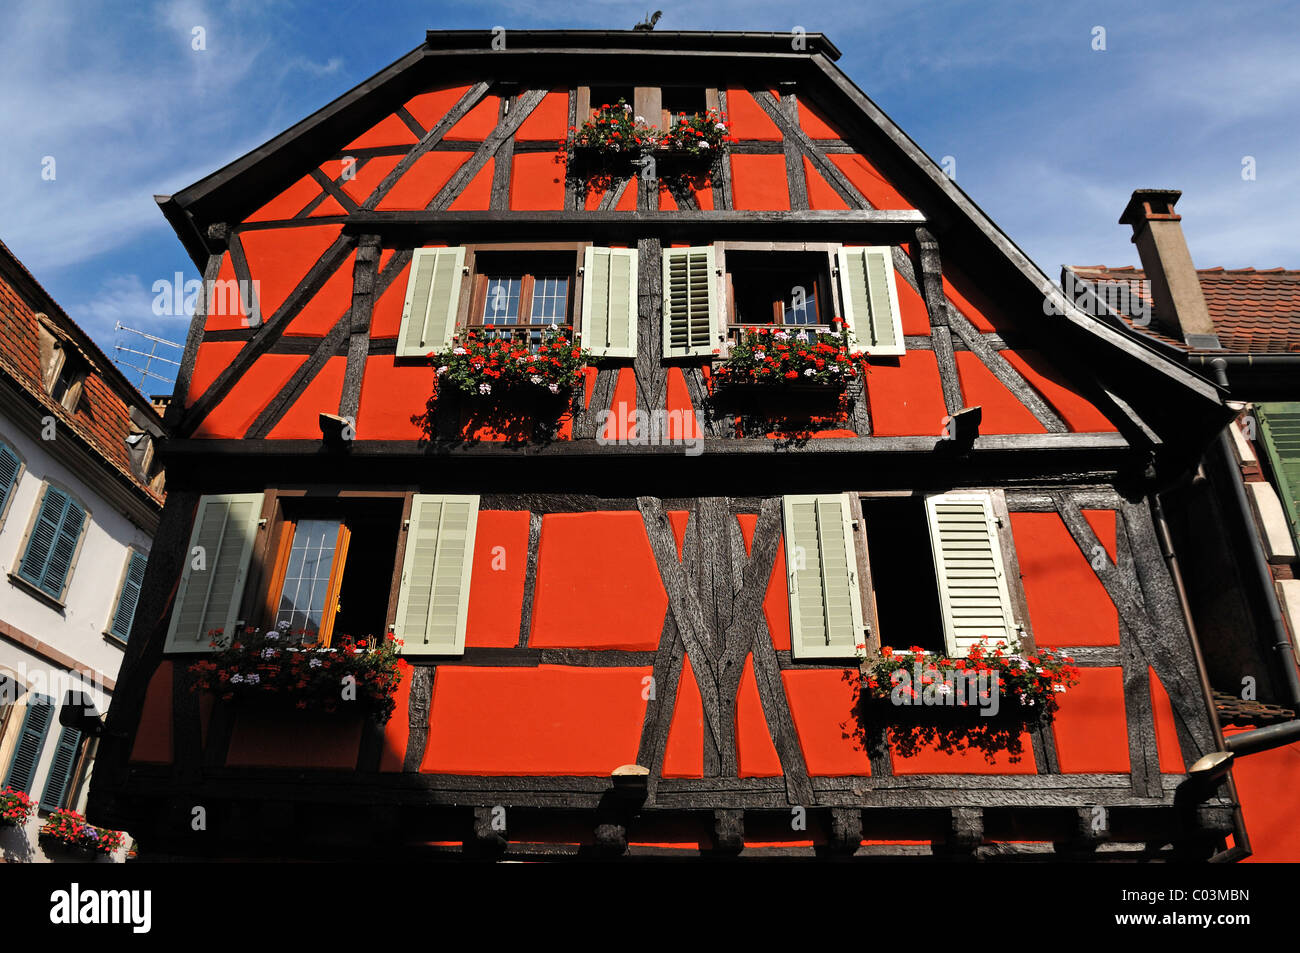 Old Alsatian half-timbered facade, 1 Rue de Juifs, Ribeauvillé, Alsace, France, Europe - Stock Image